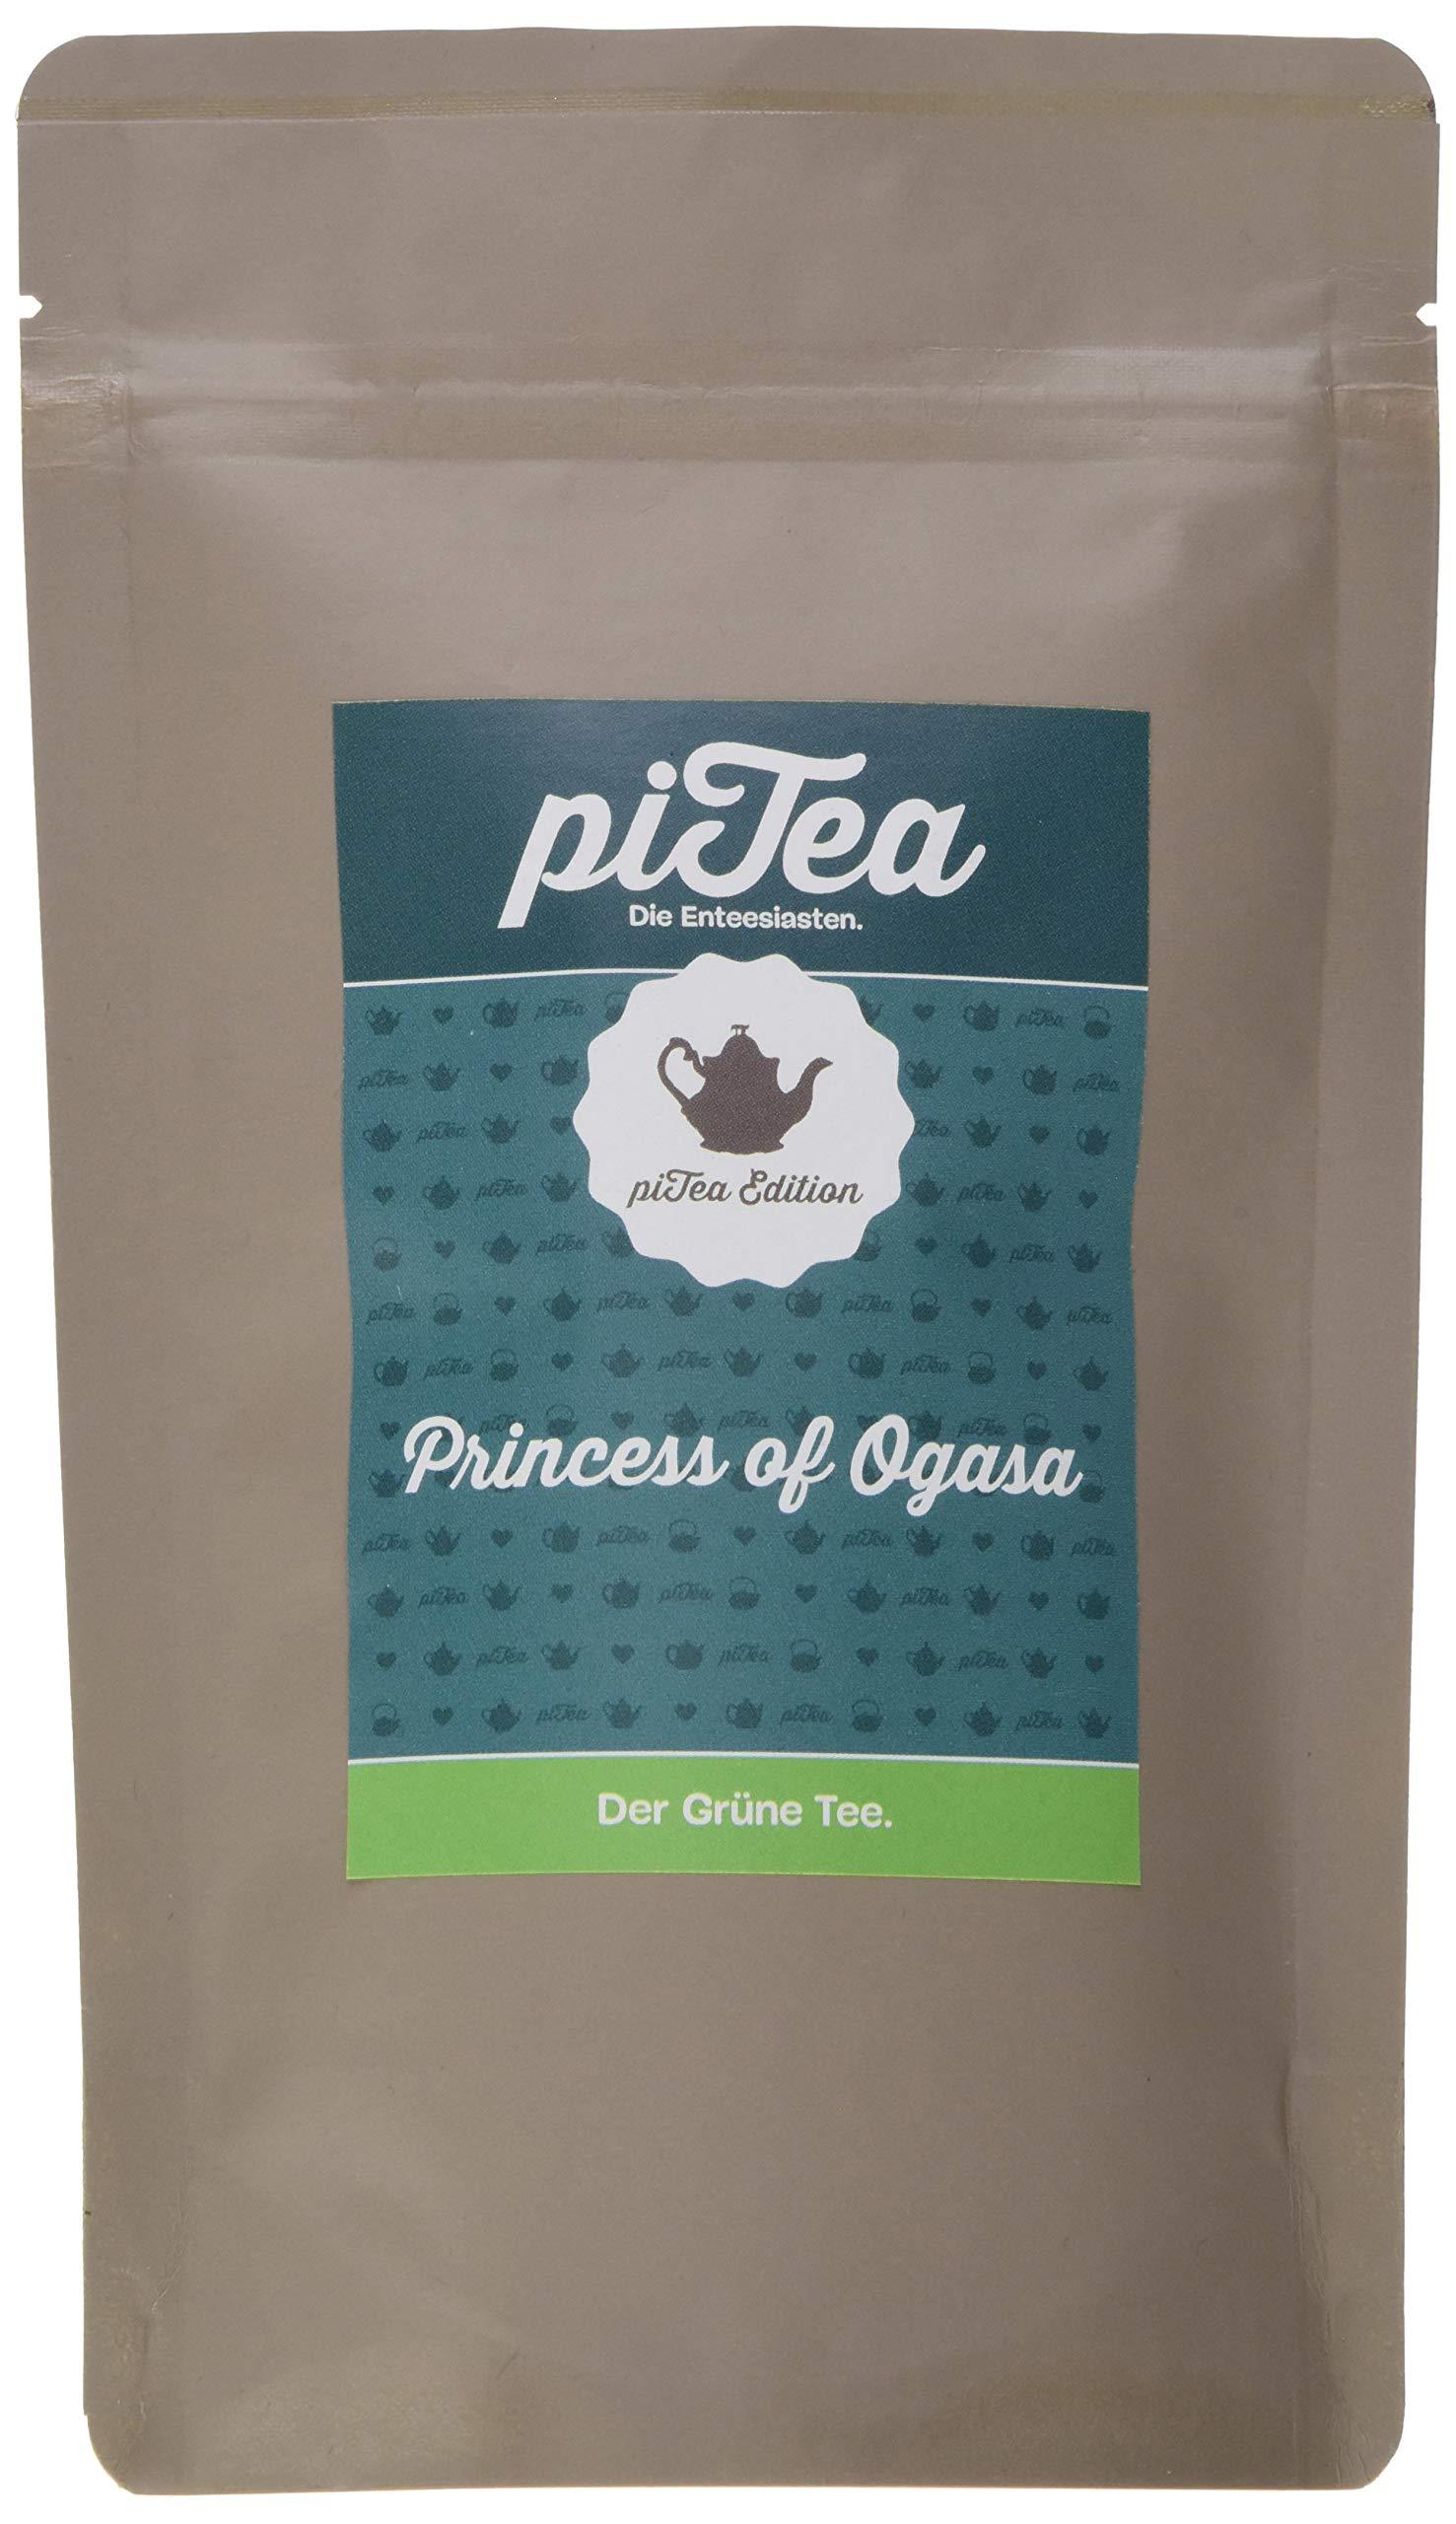 Pi-Tea-Princess-of-Ogasa-Tte-Grner-Tee-natrlich-und-vegan-2er-Pack-2-x-75-g